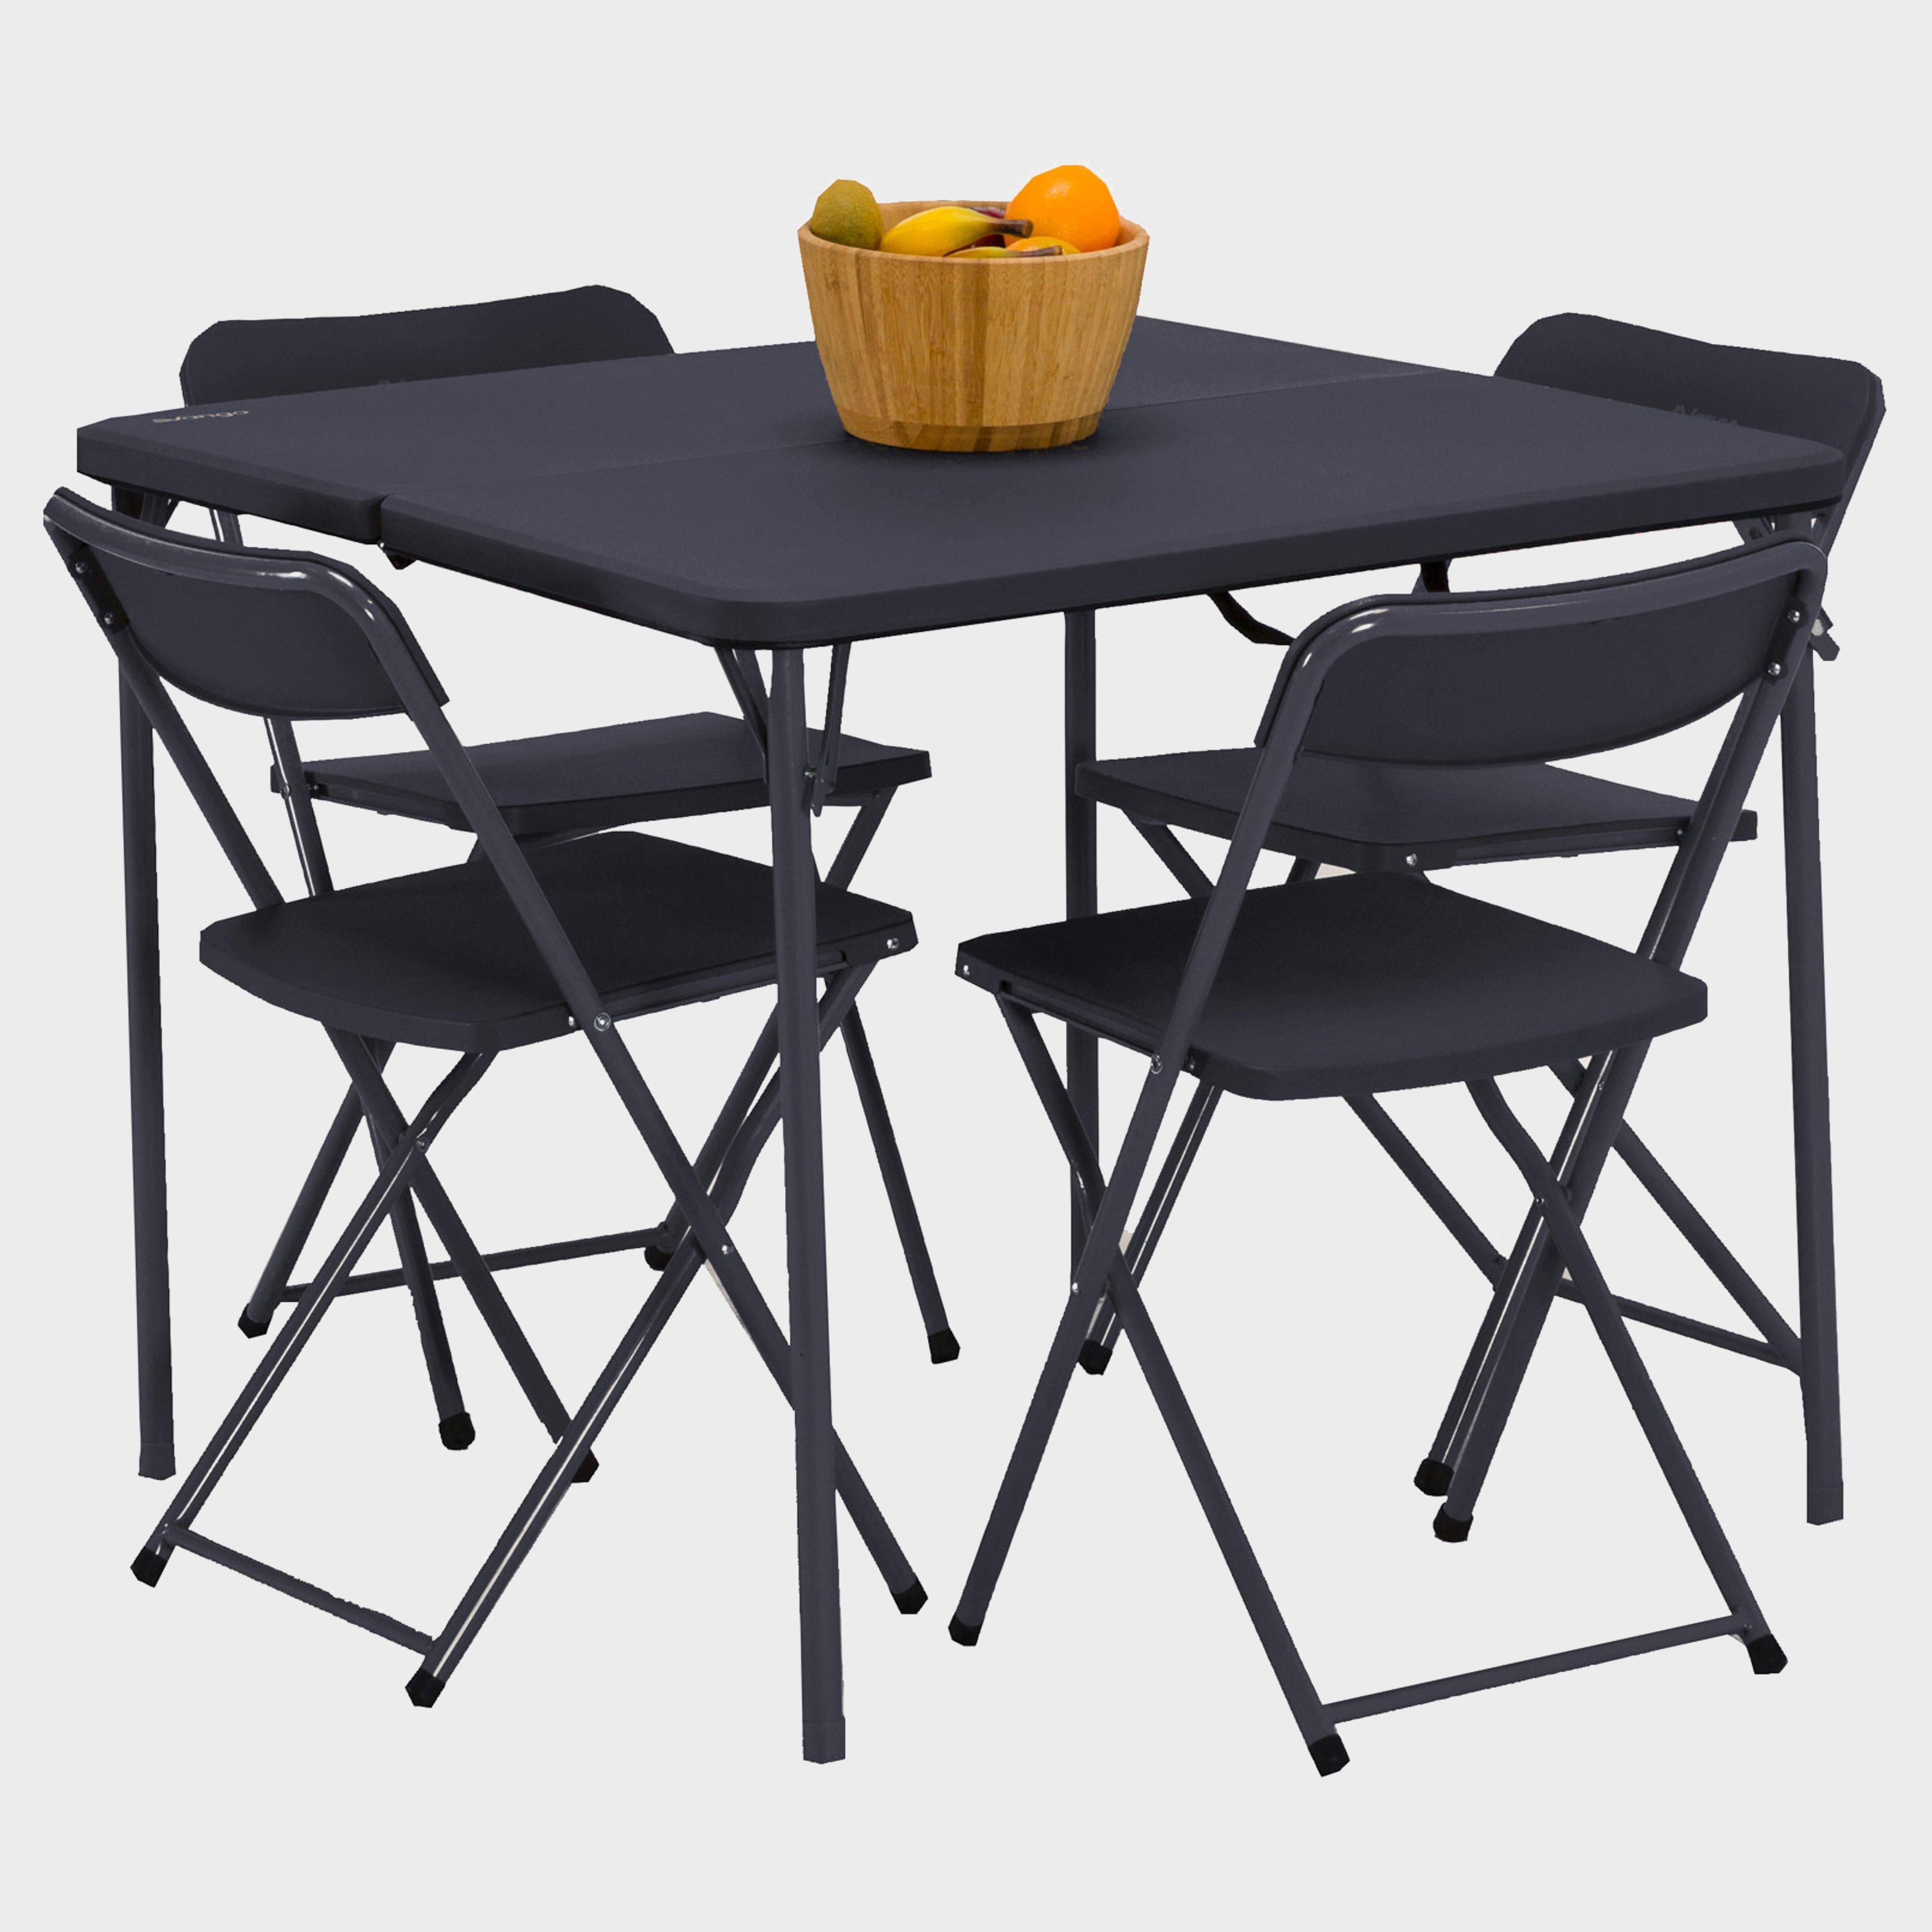 Vango Vango Dornoch Table and Chairs Set - Black, Black